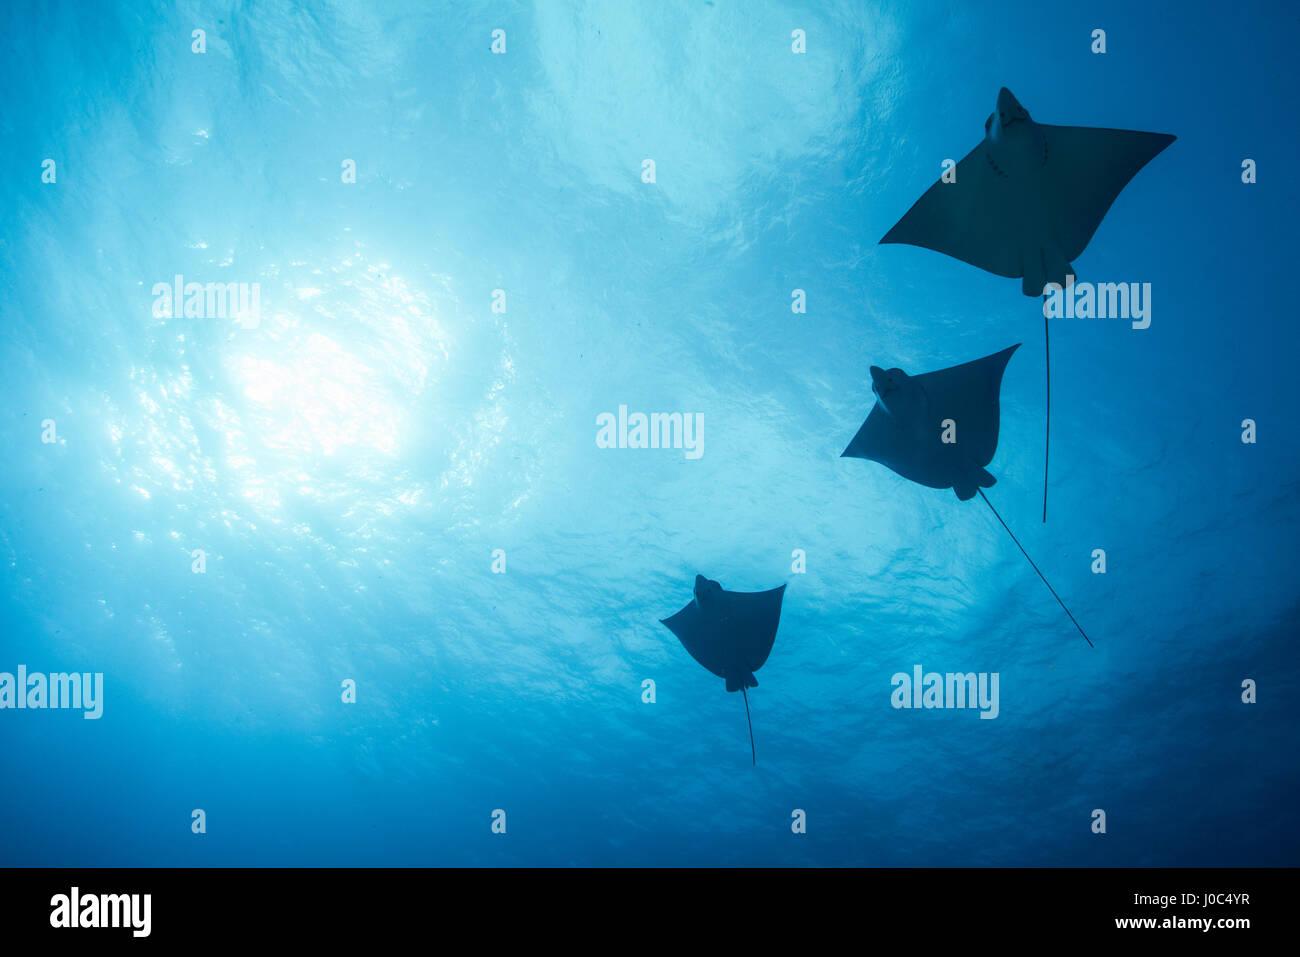 Eagle rays (aetobatus narinari) swimming, underwater view,  Cancun, Mexico - Stock Image